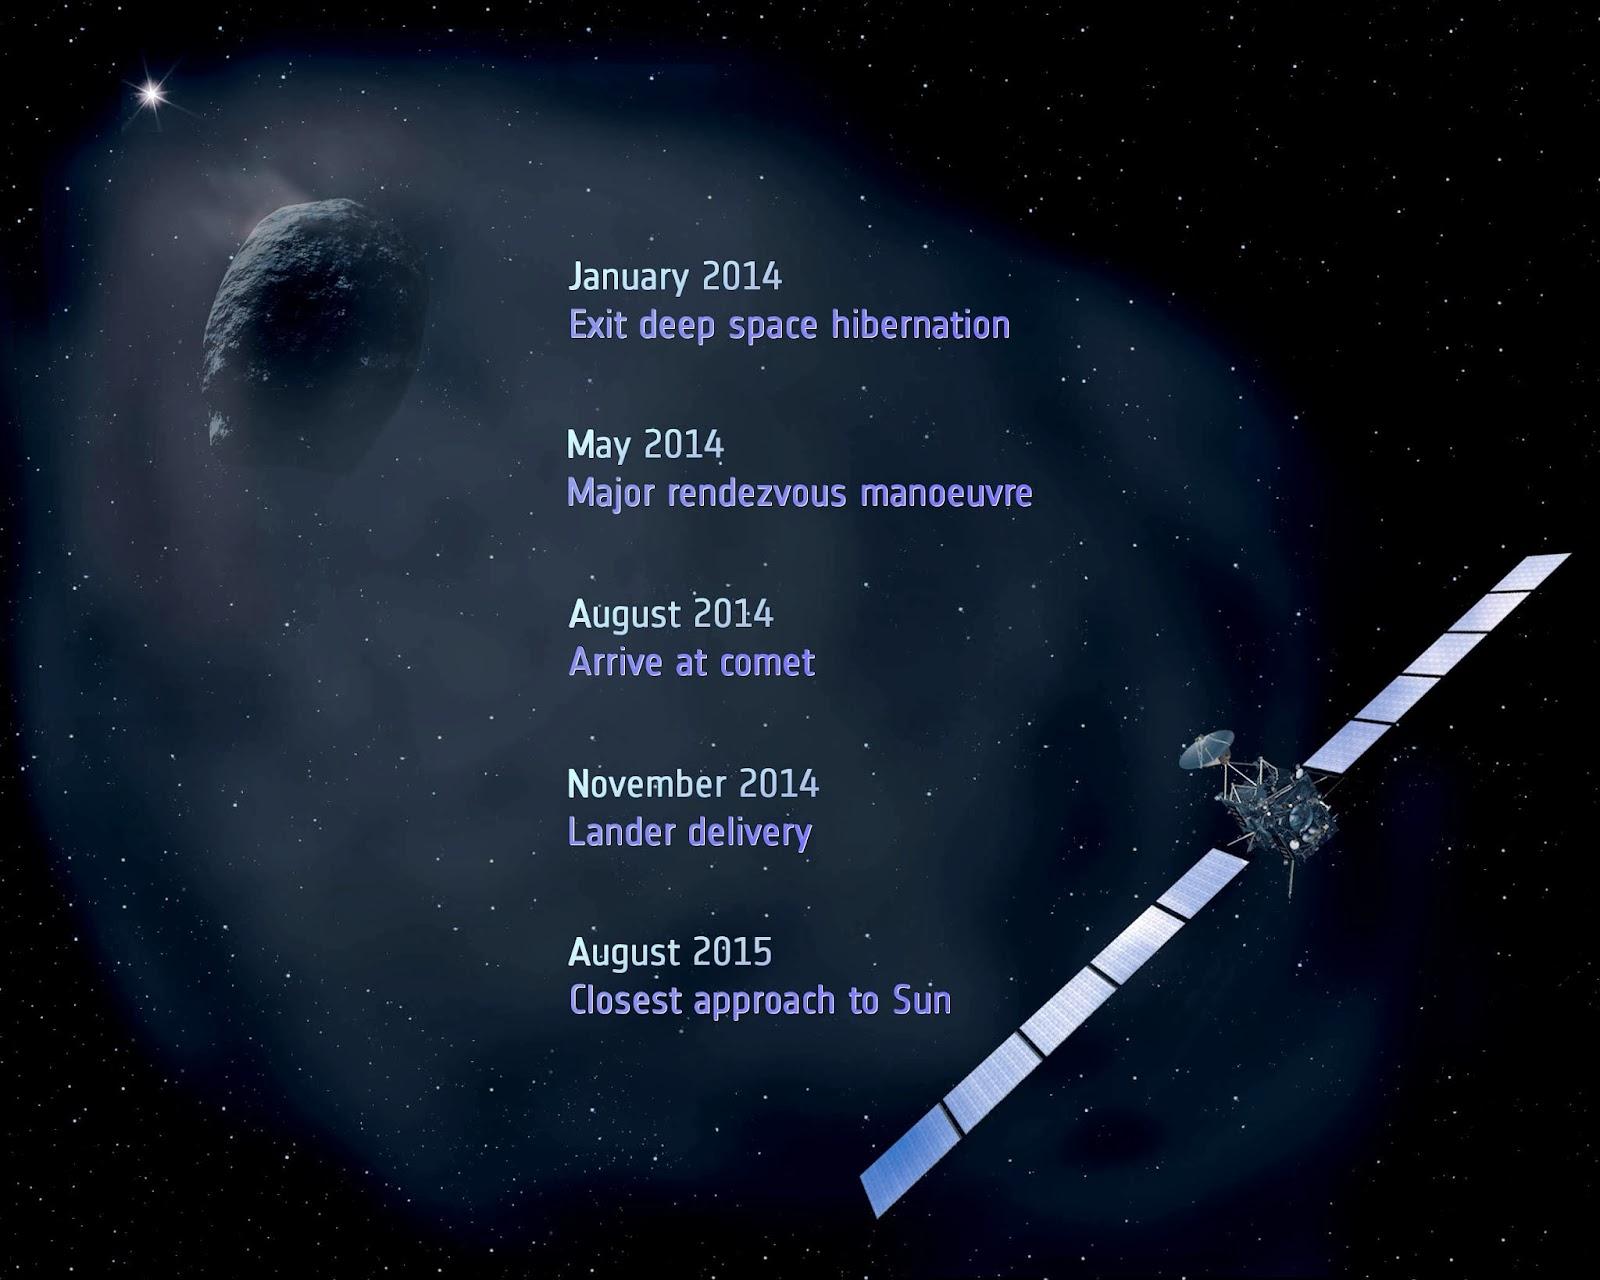 http://3.bp.blogspot.com/-XvFsrcdQZvo/UllW_-MrRnI/AAAAAAAAcBM/YA0OYygdmXk/s1600/Rosetta_mission_milestones.jpg